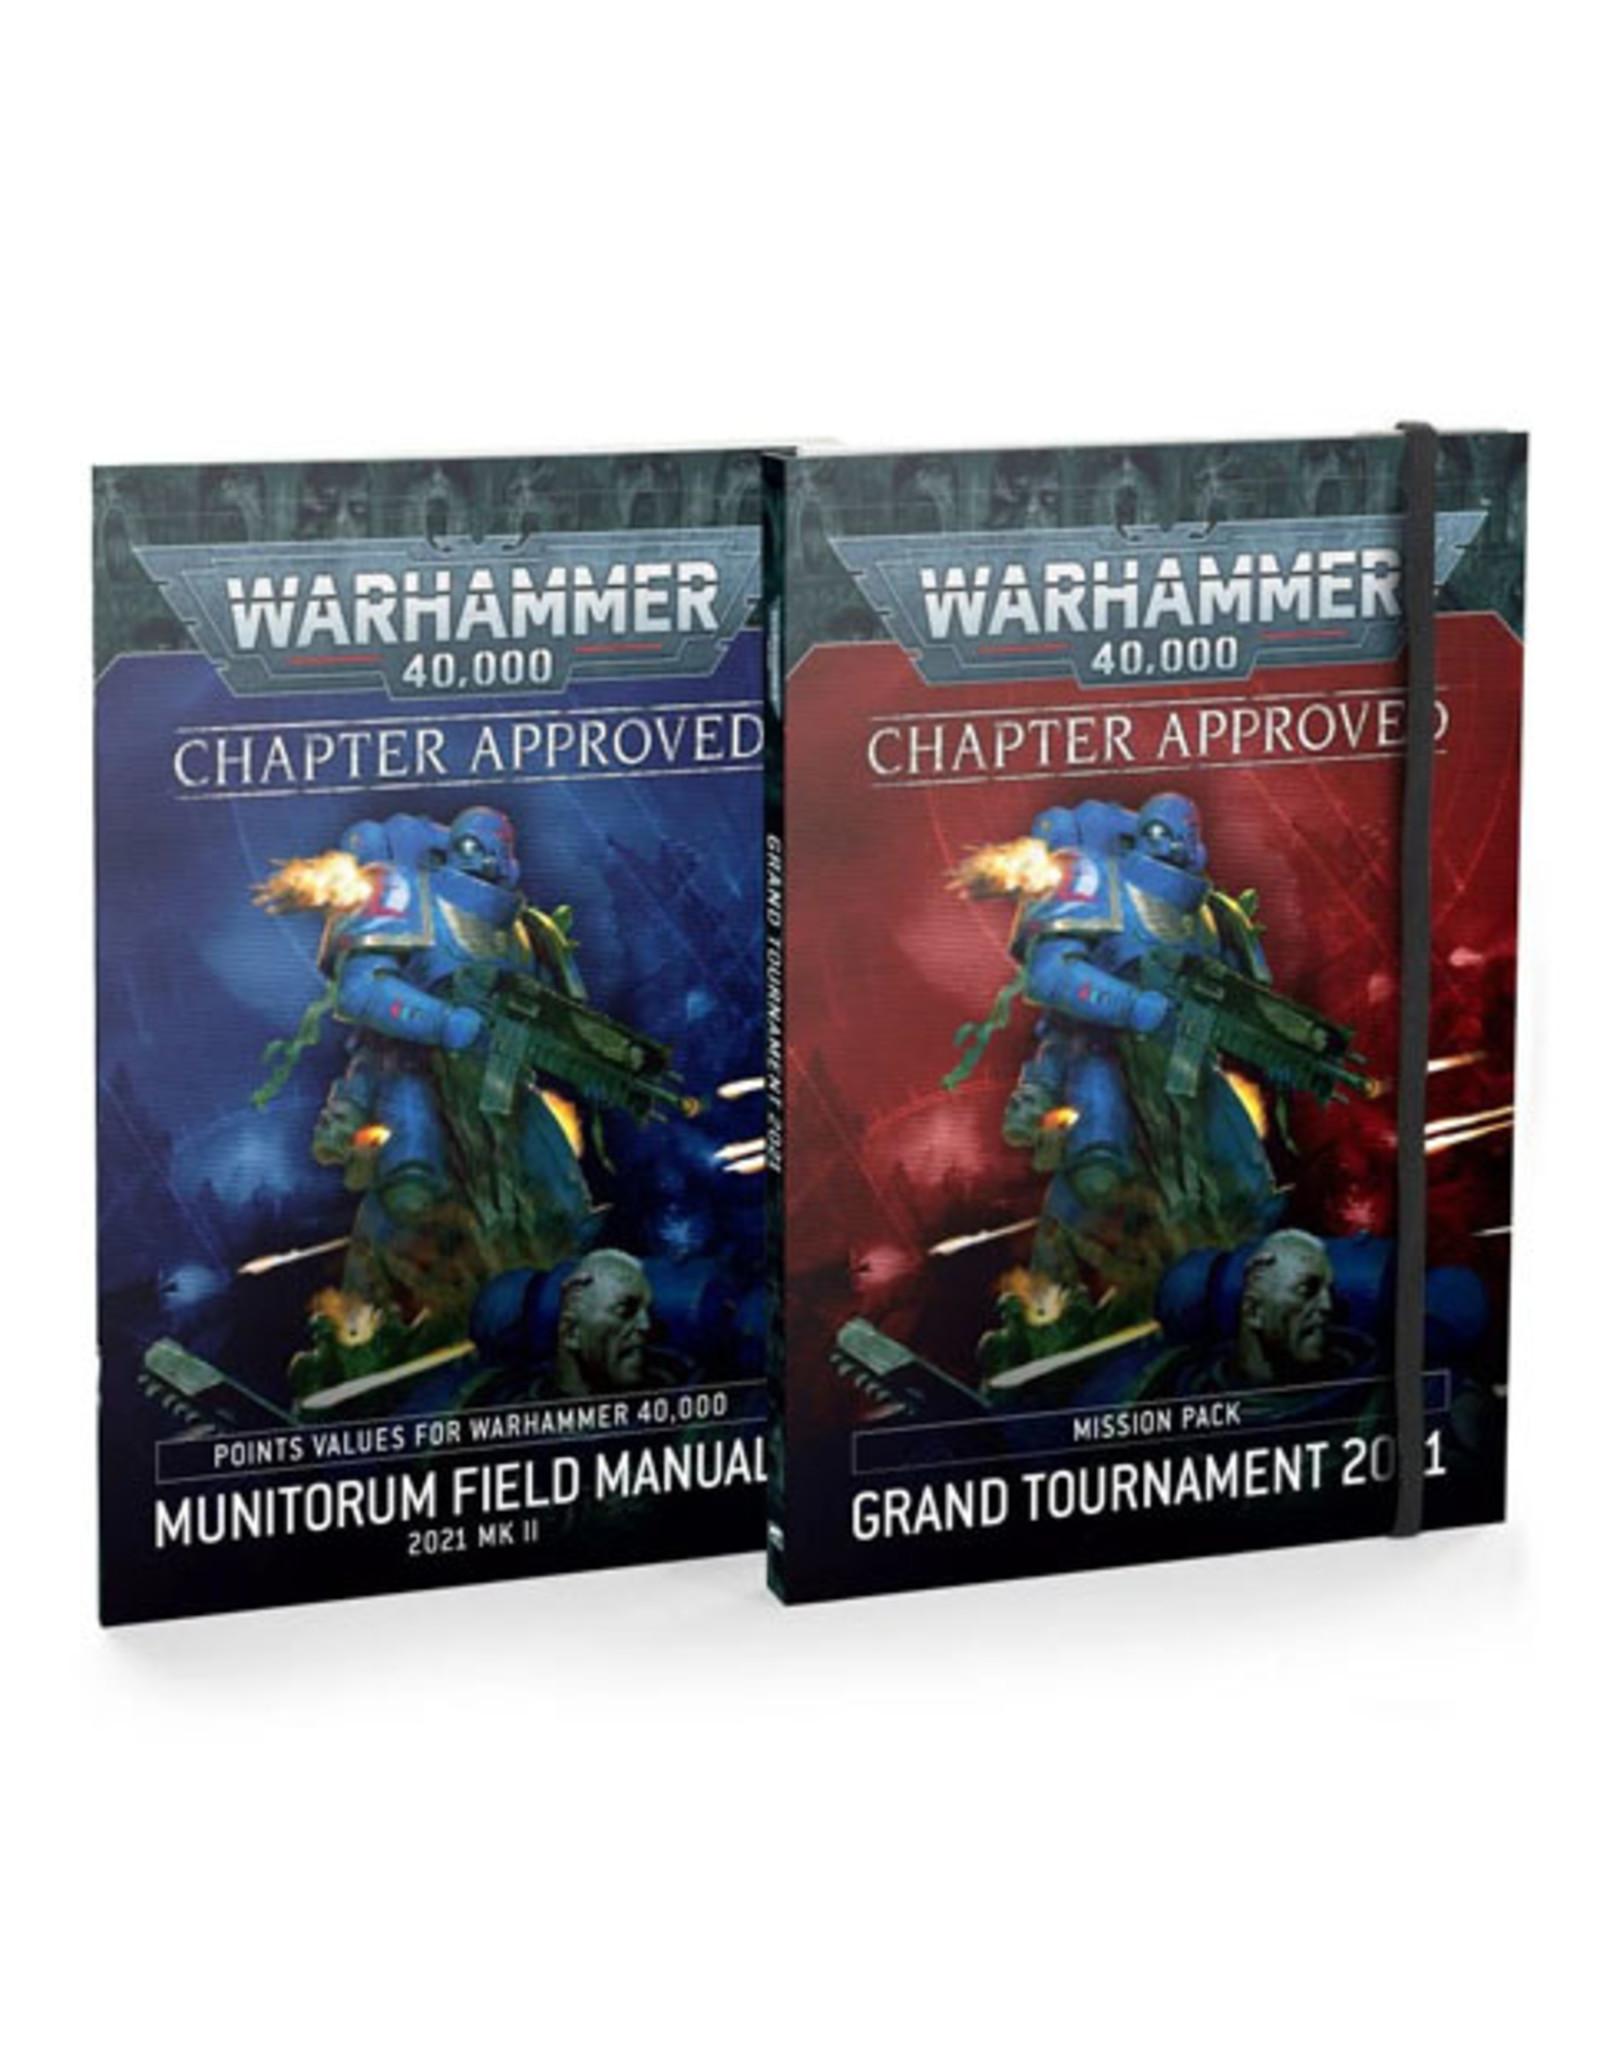 Warhammer 40k Grand Tournament Mission Pack Jun-21